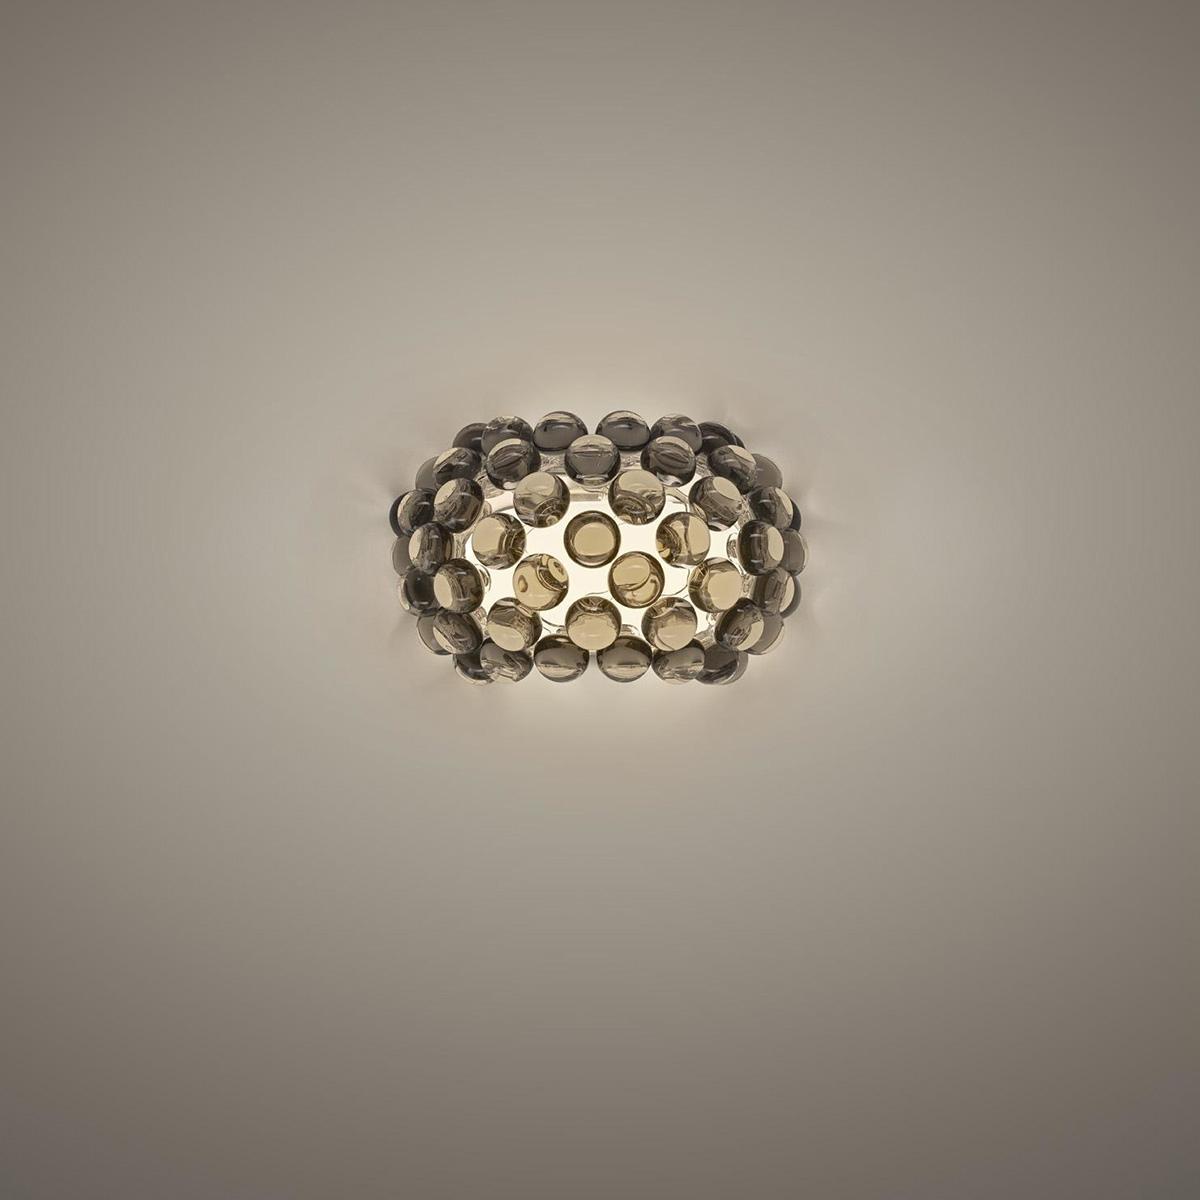 Led zidna lampa CABOCHE PLUS LED 311025-25 dim siva